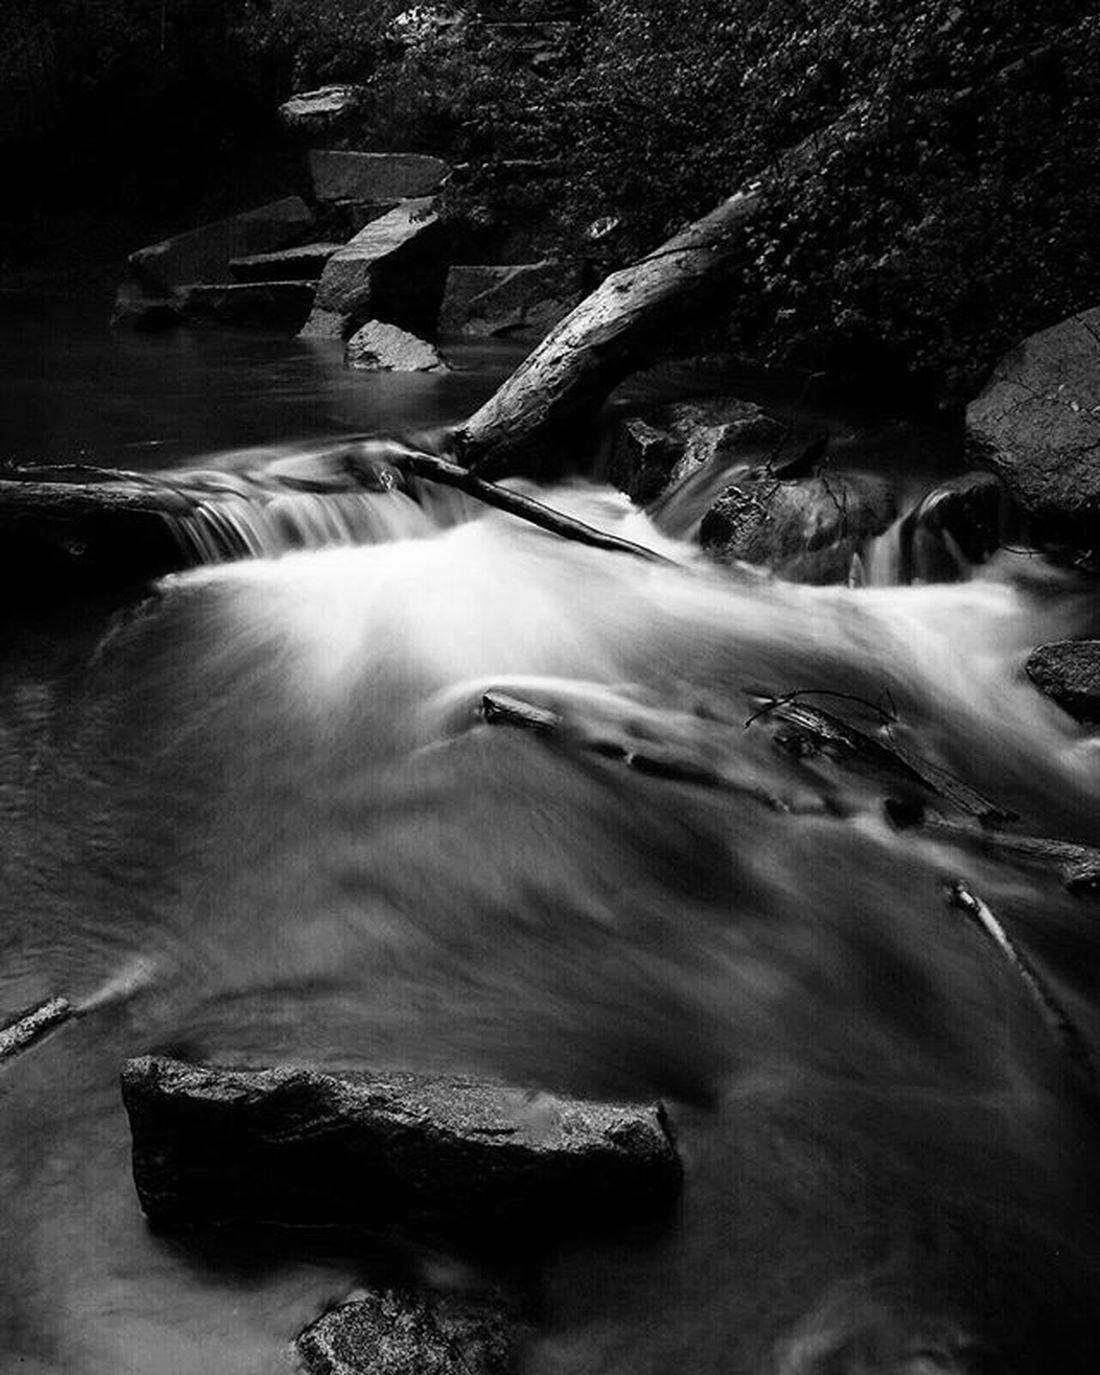 More monochrome the rainy weekend. Monochrome Water Millcreekcanyon Utah Blackandwhitephoto Longexposure Visitutah